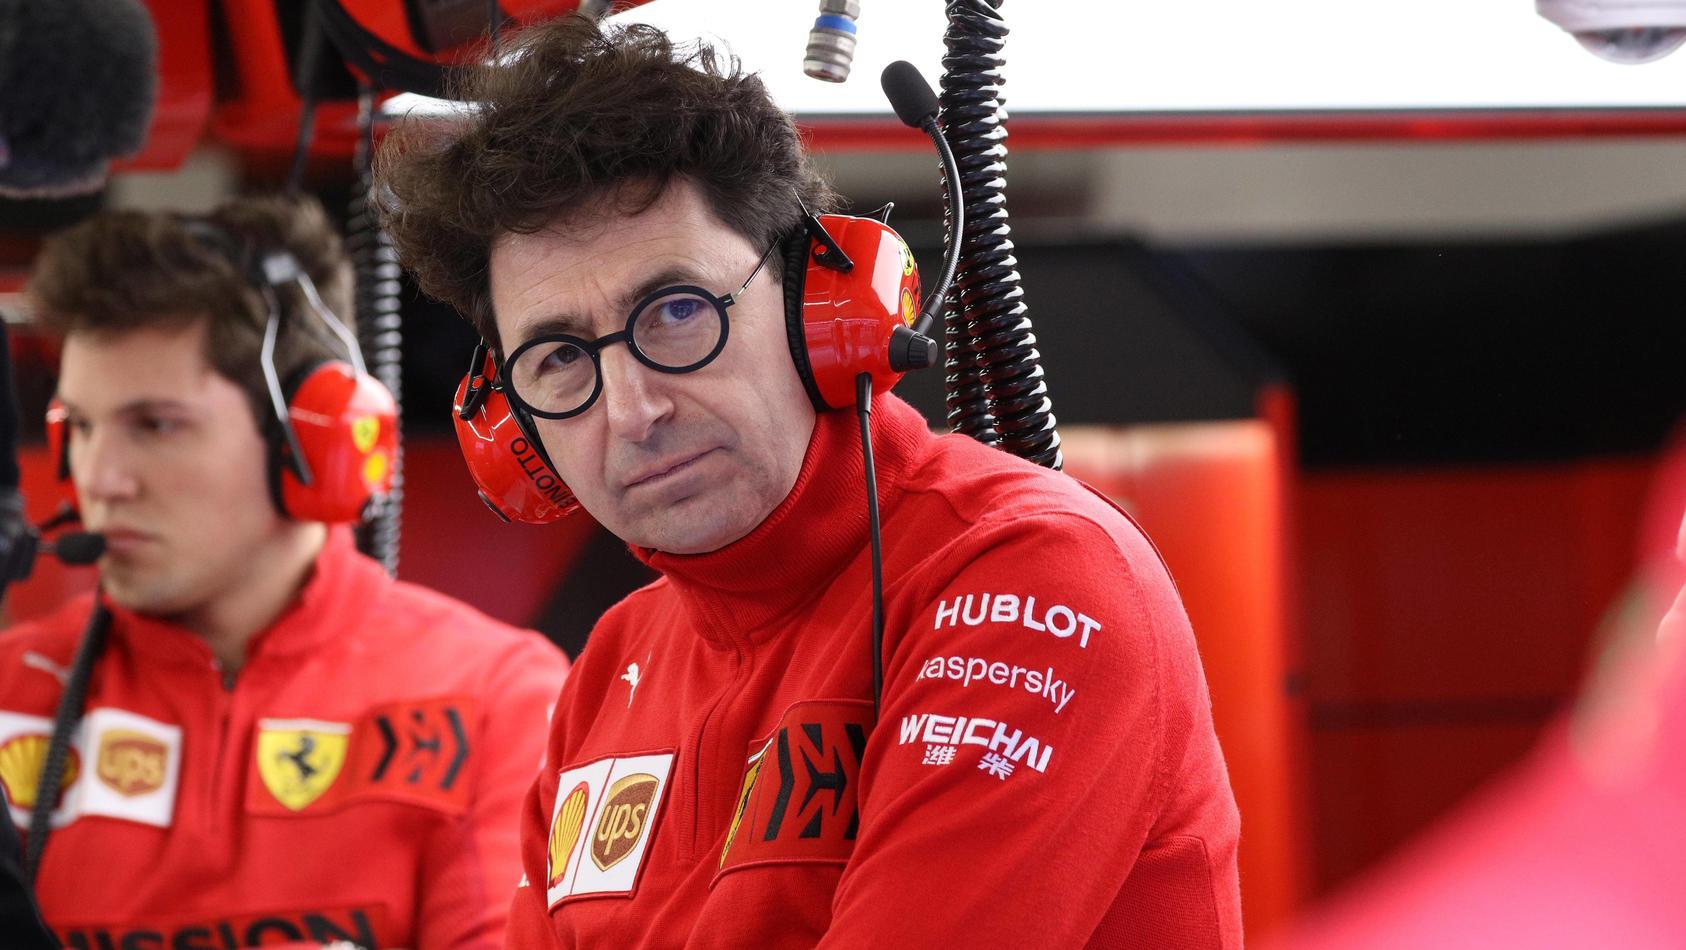 Motorsports: FIA Formula One World Championship, WM, Weltmeisterschaft 2020, Preseason Testing in Barcelona, Mattia Bin